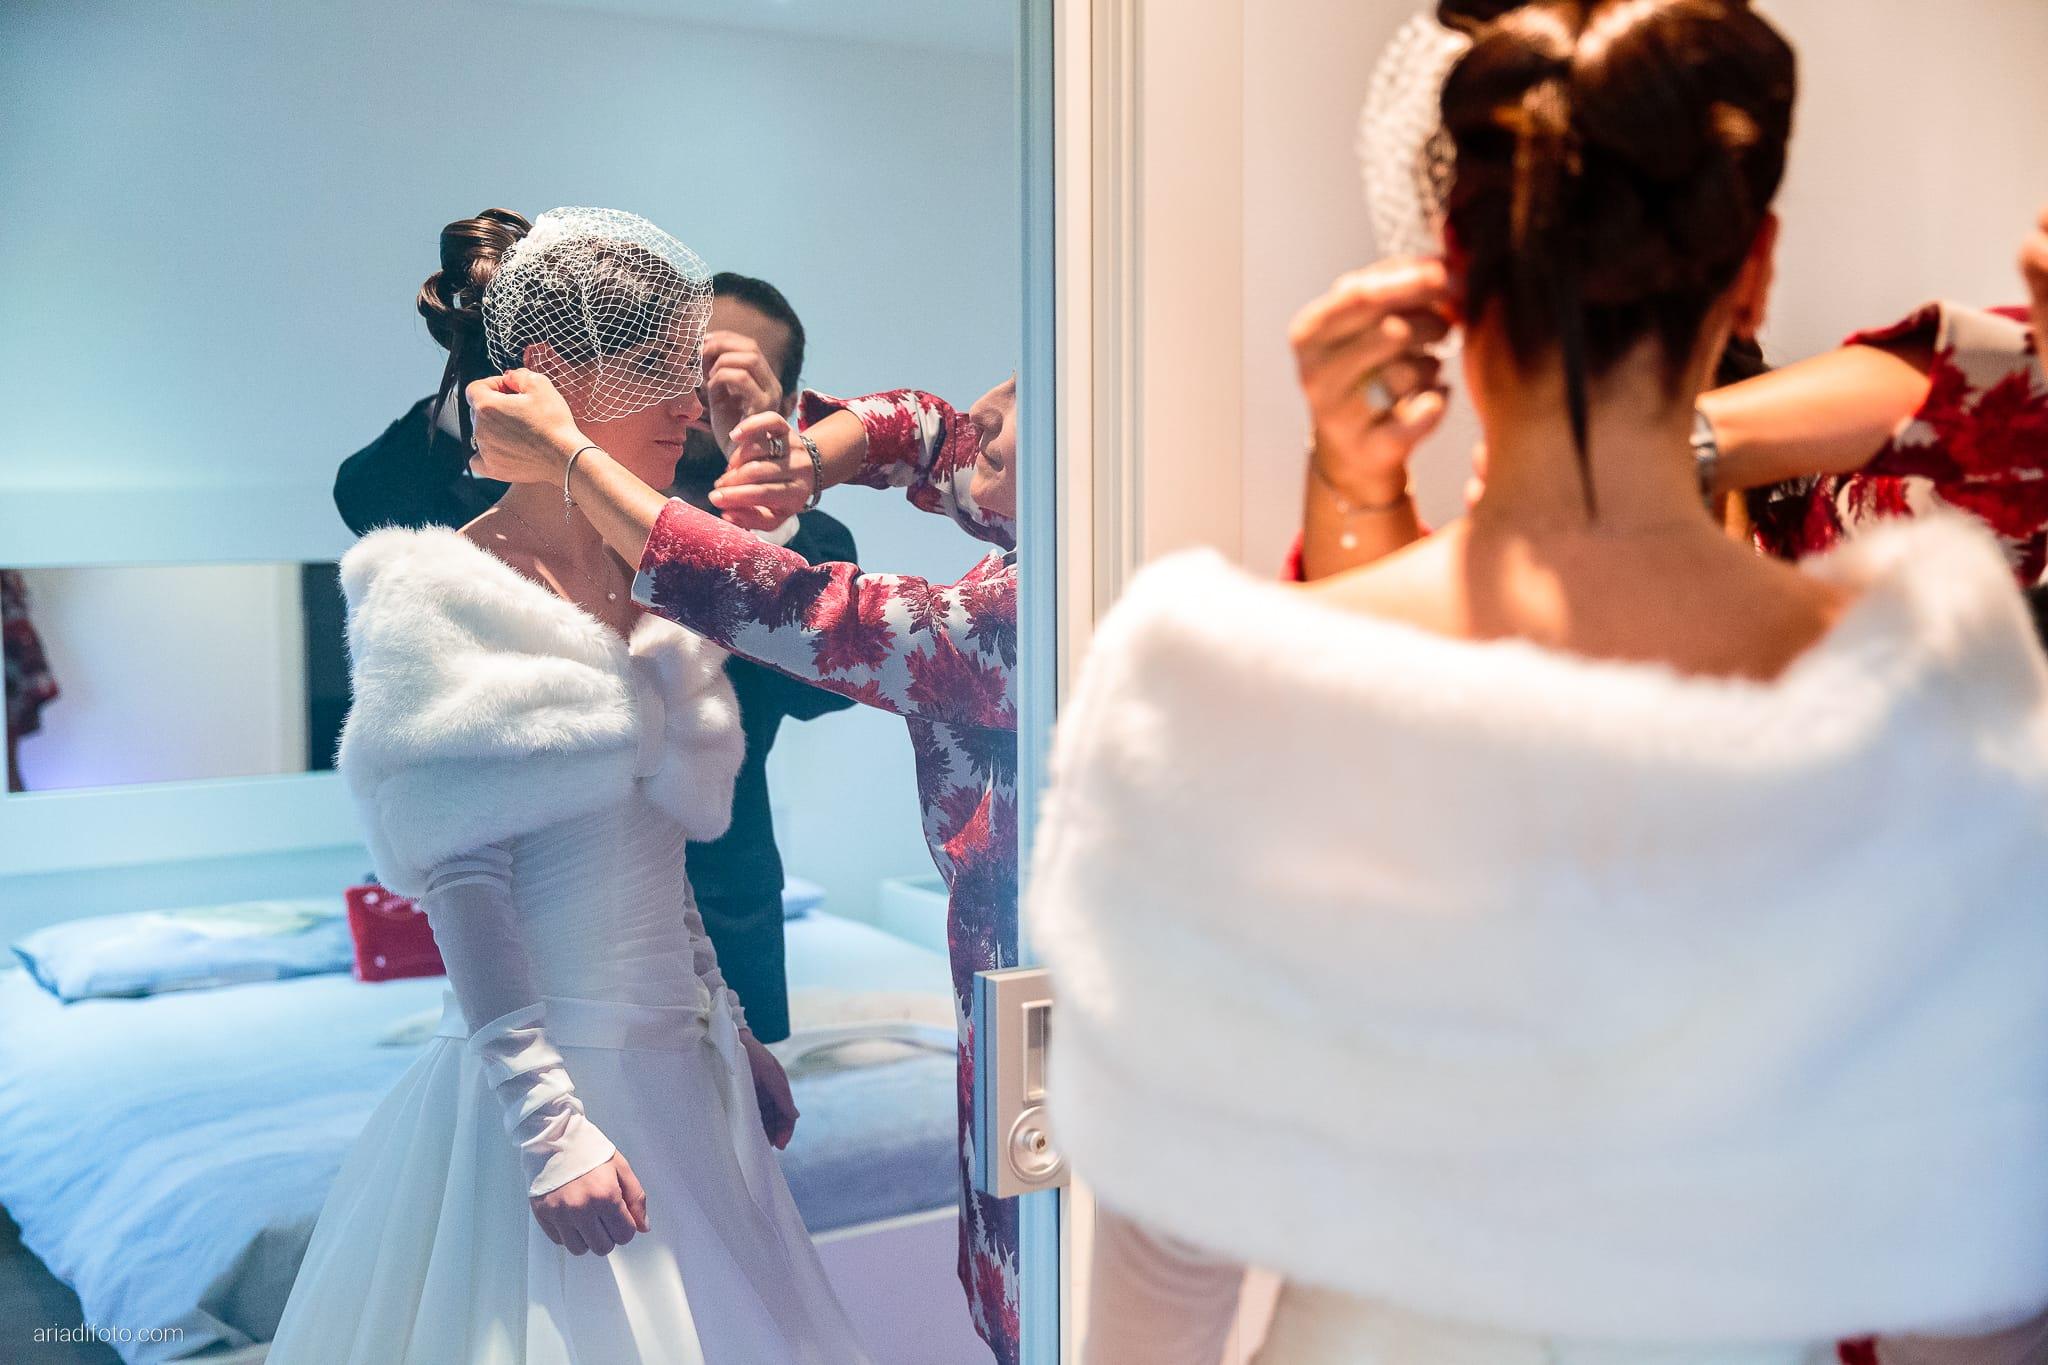 Elisa Matteo matrimonio Preval Gorizia Paradiso Pocenia Udine preparativi riflesso specchio veletta